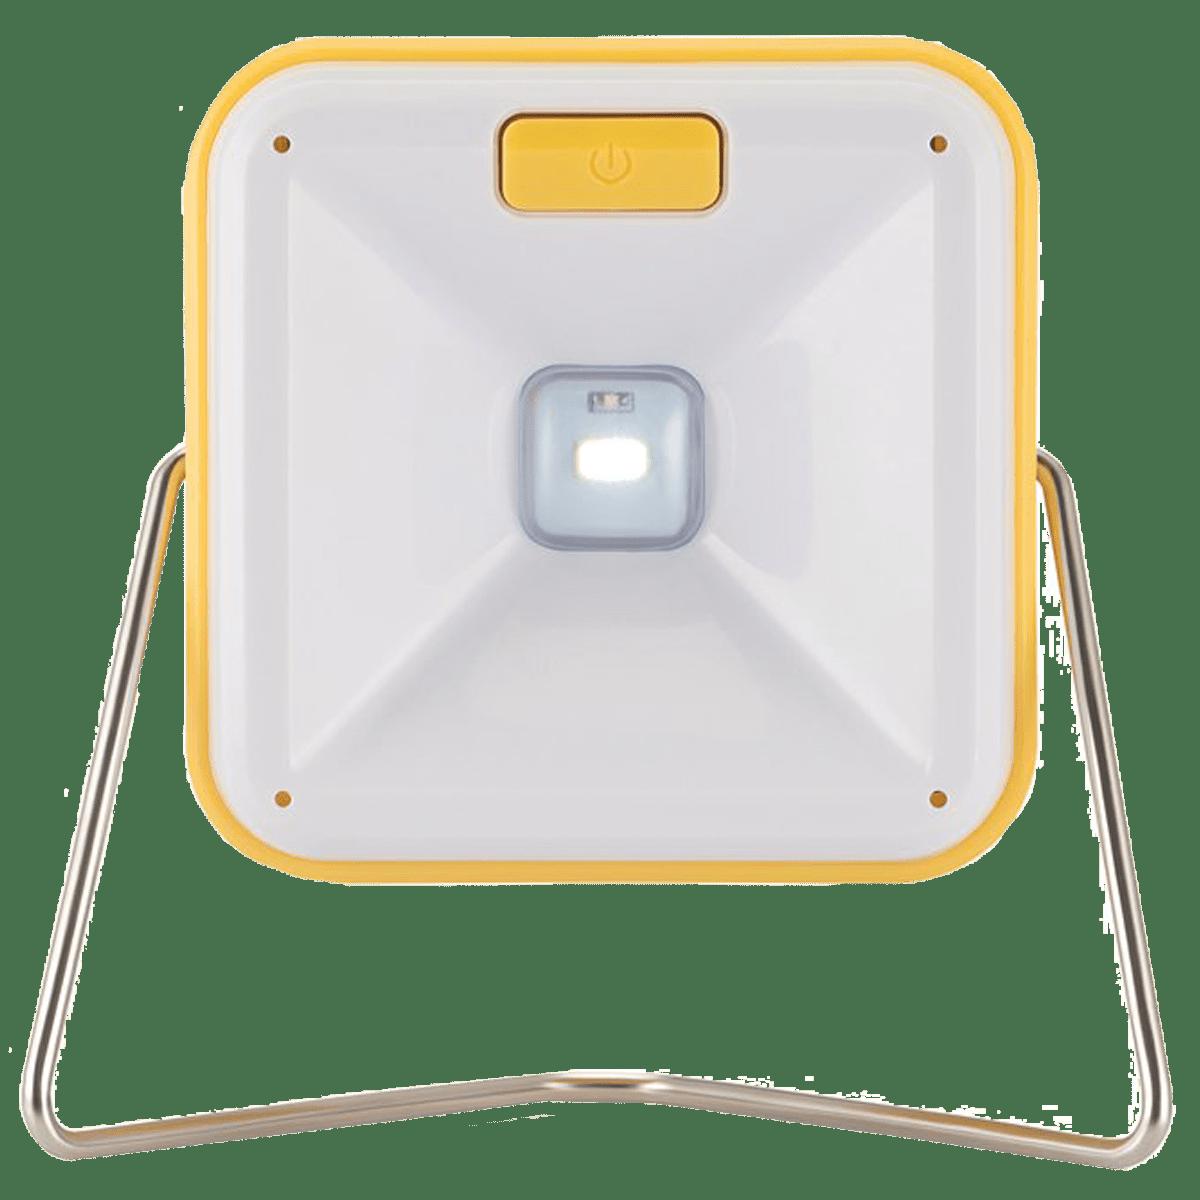 Agni Solar Mini Light 1 0.3 Watts Solar LED Light (2 Brightness Modes, AG-001, Yellow)_1